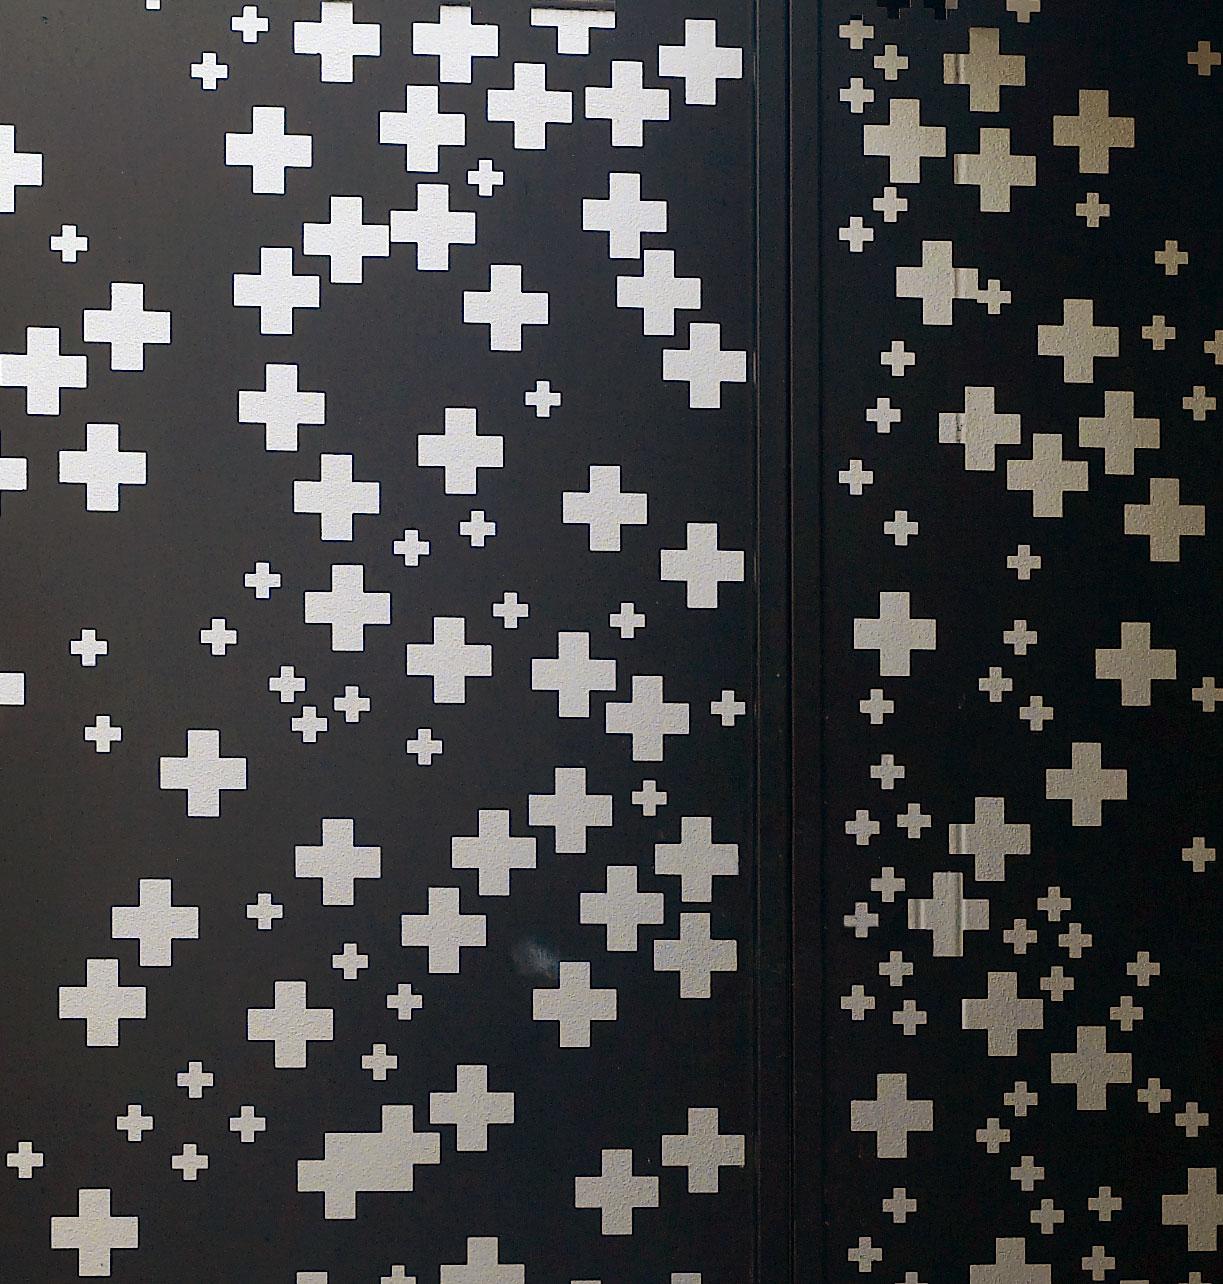 pattern_3.jpg